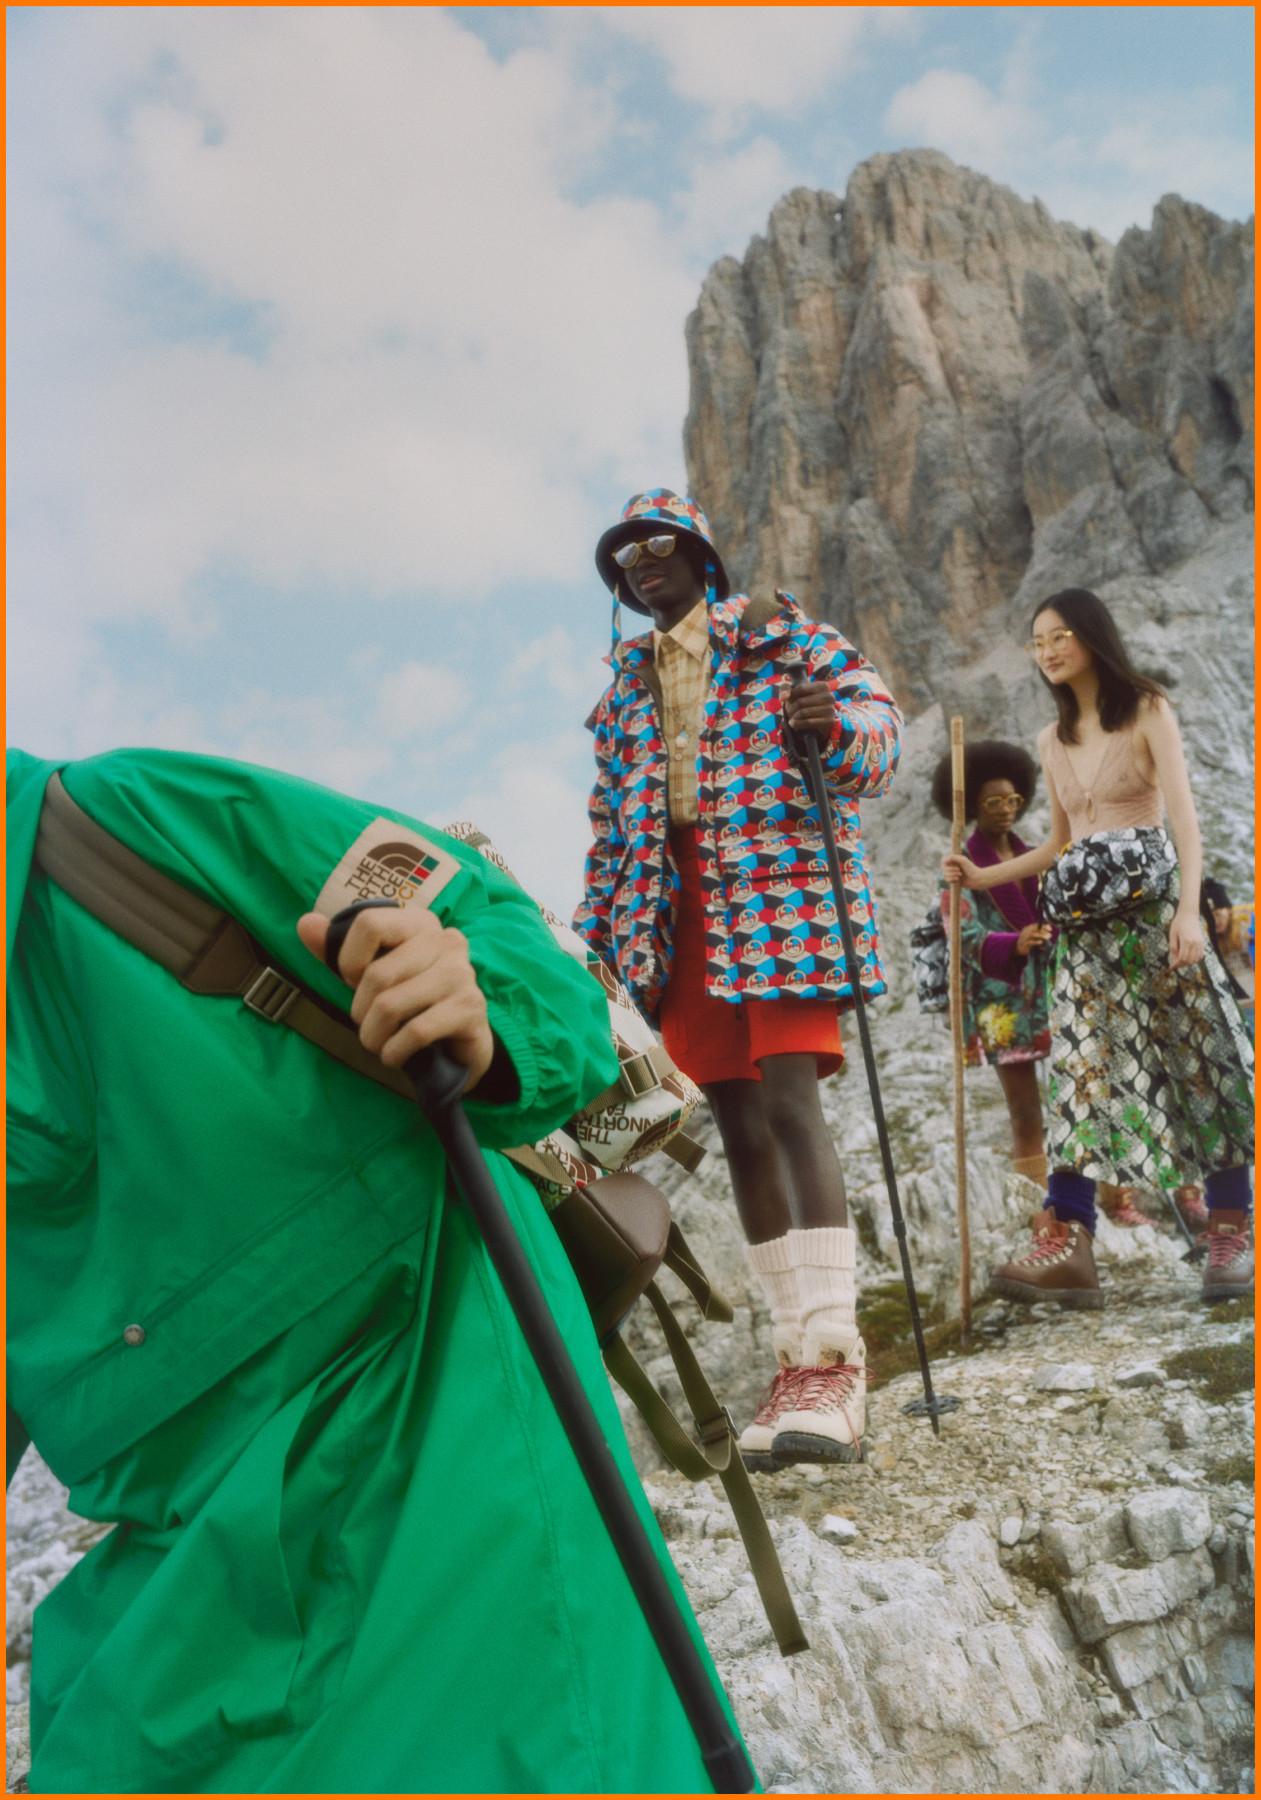 Gucci x The North Face Collaboration